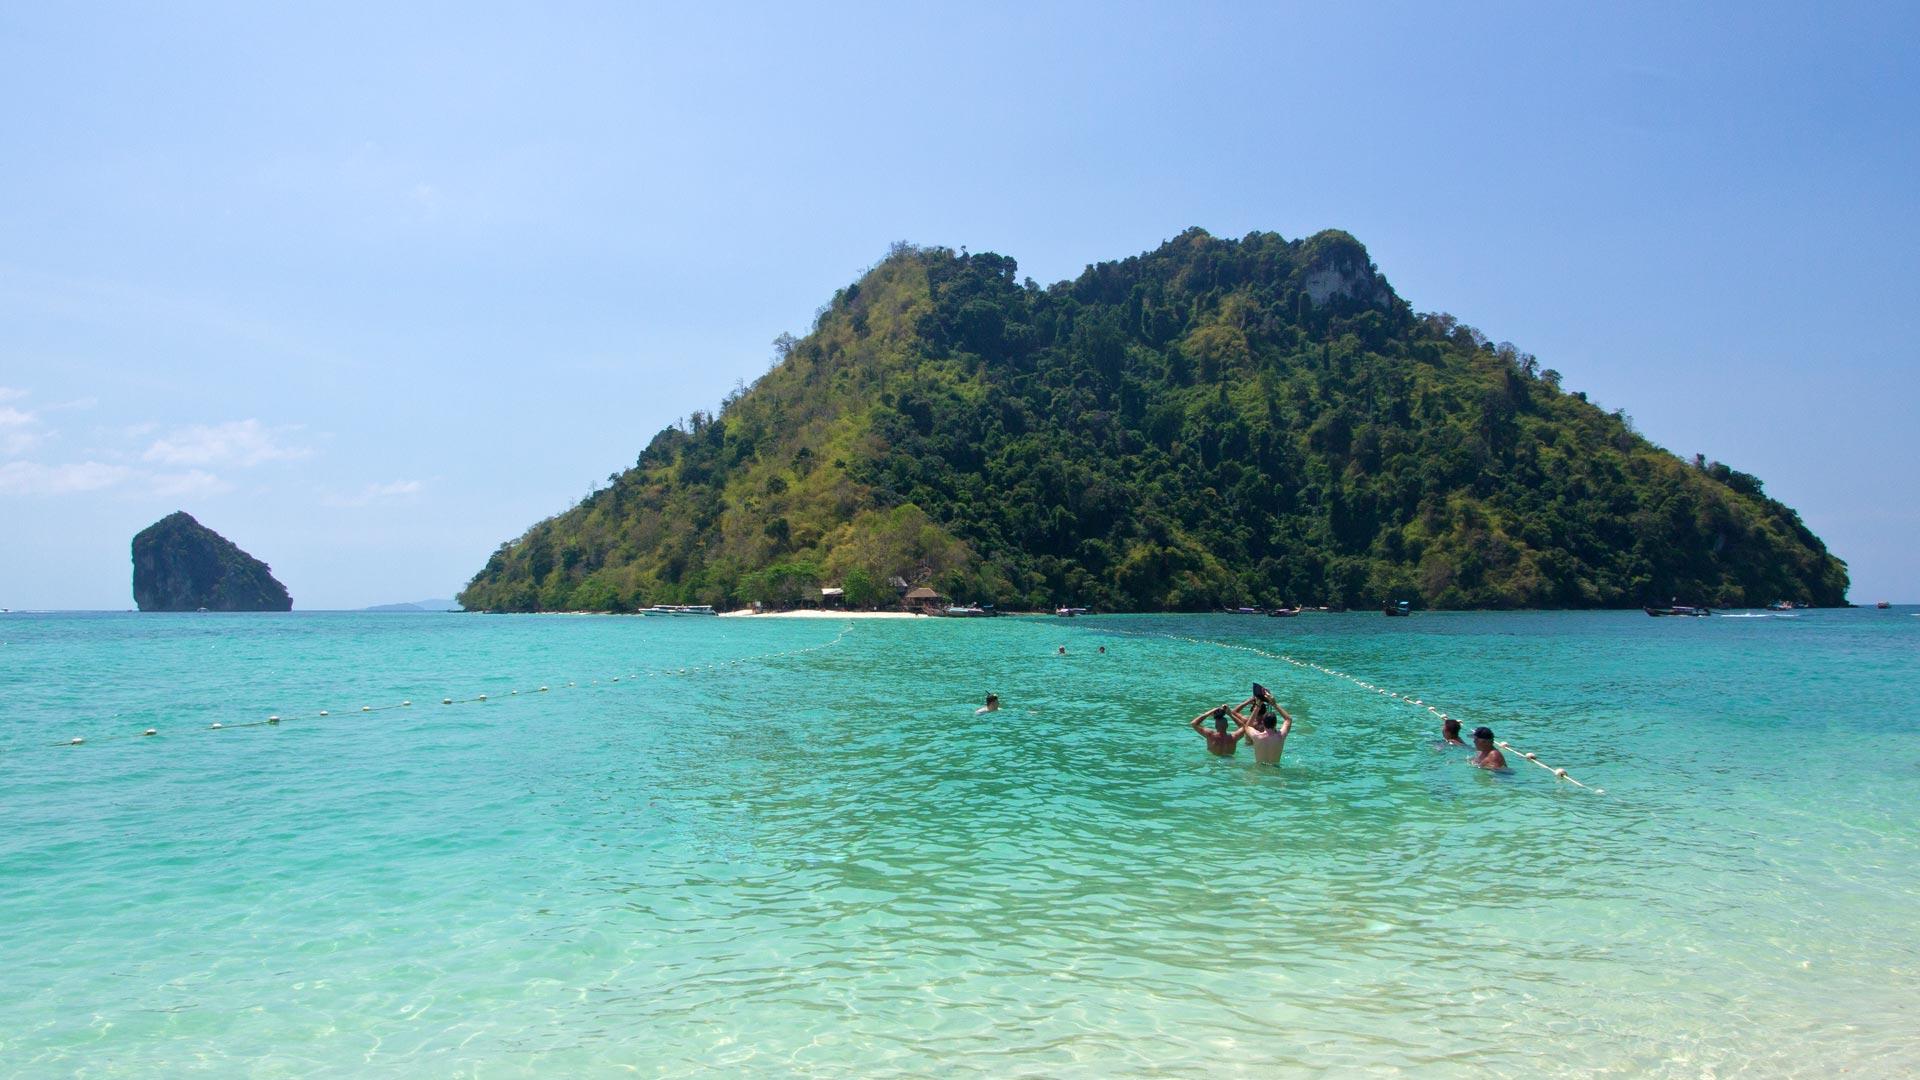 Chicken Island and Tub Island in Krabi – a day trip | Travel blog ...